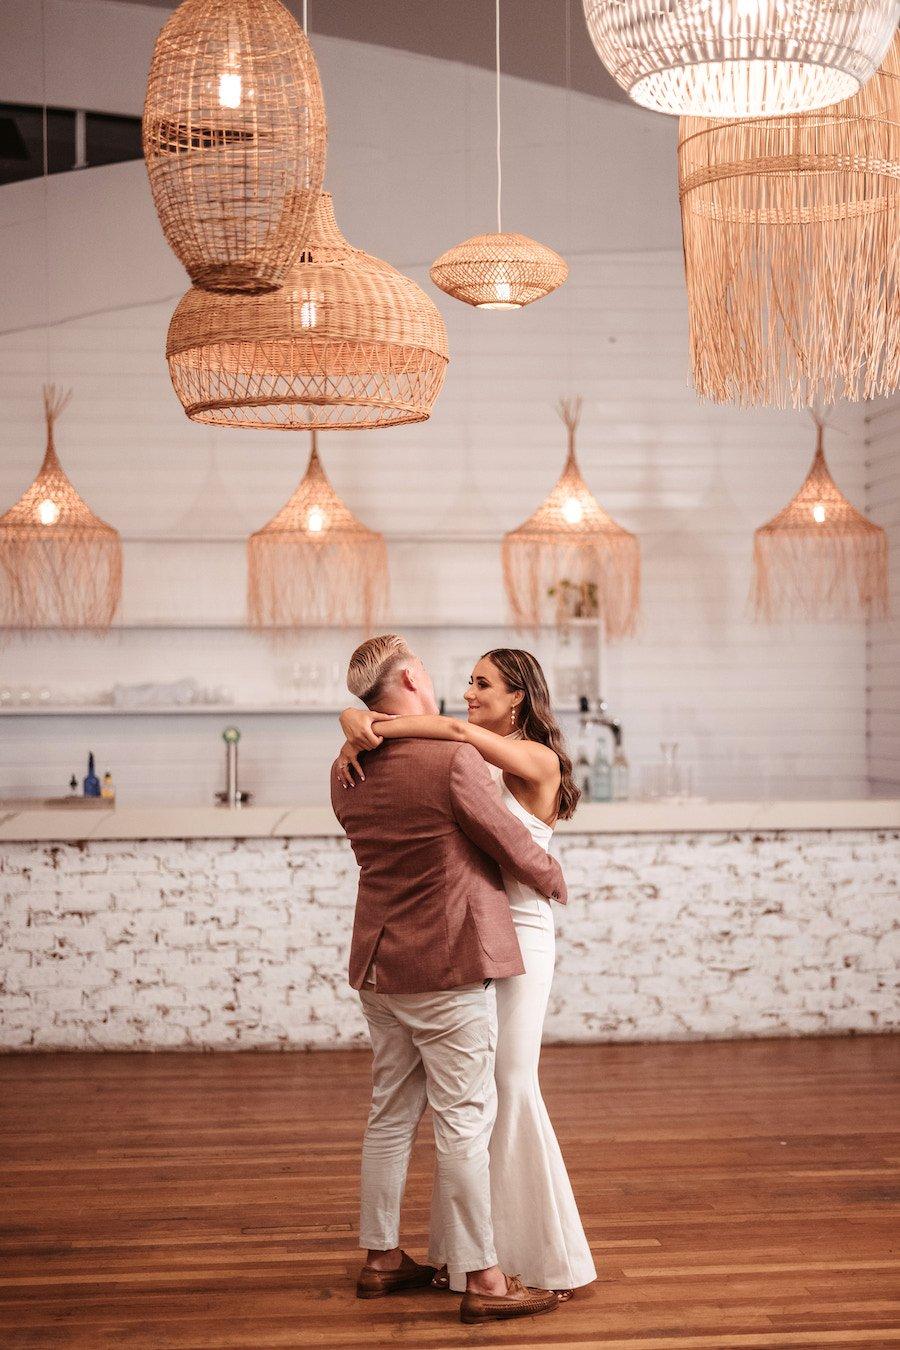 Mediterranean inspired interior for wedding reception venue